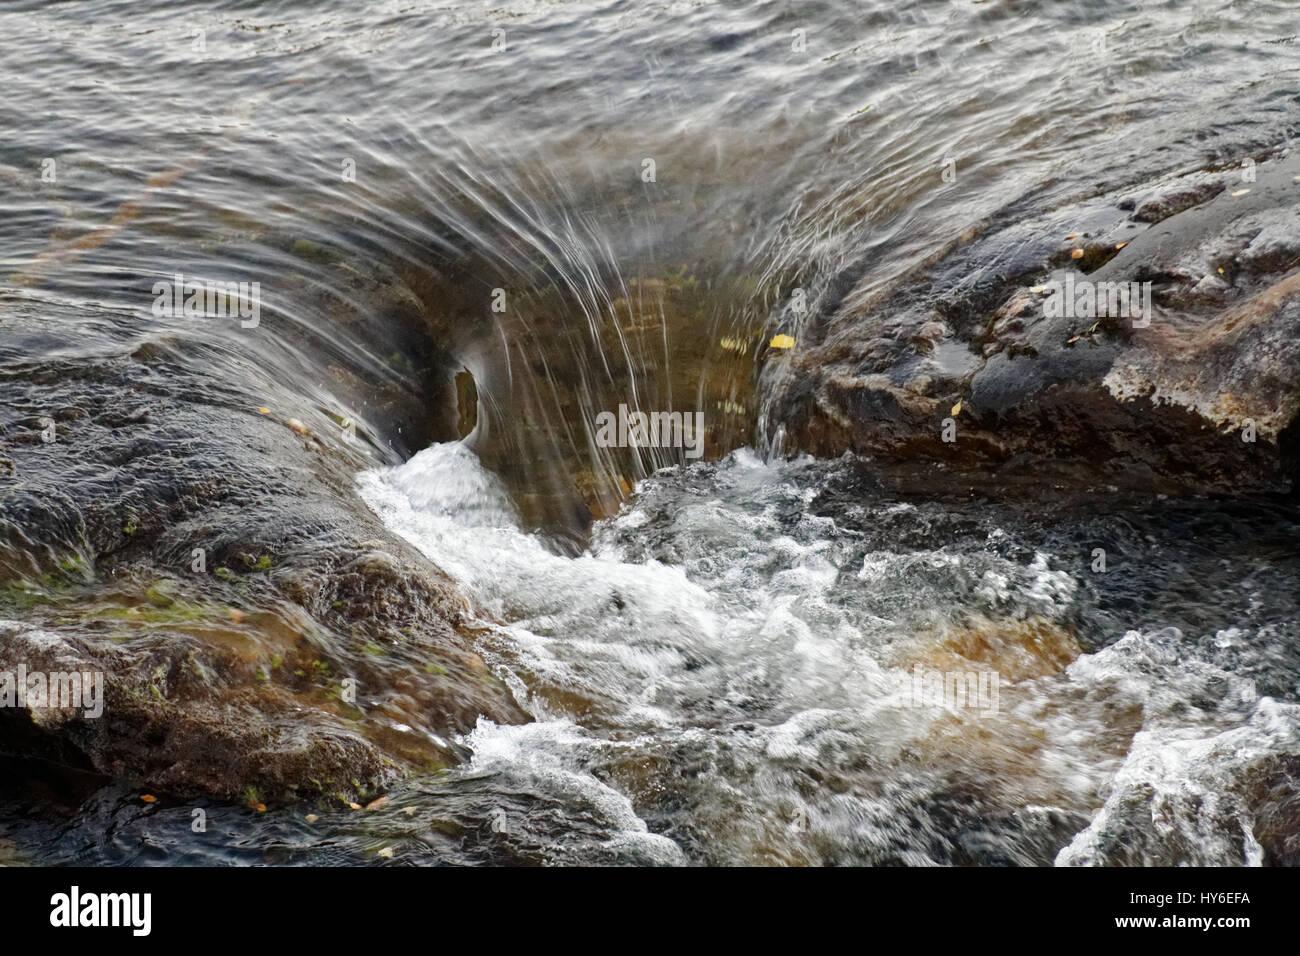 Water streaming down near Storforsen Rapids, Northern Sweden - Stock Image